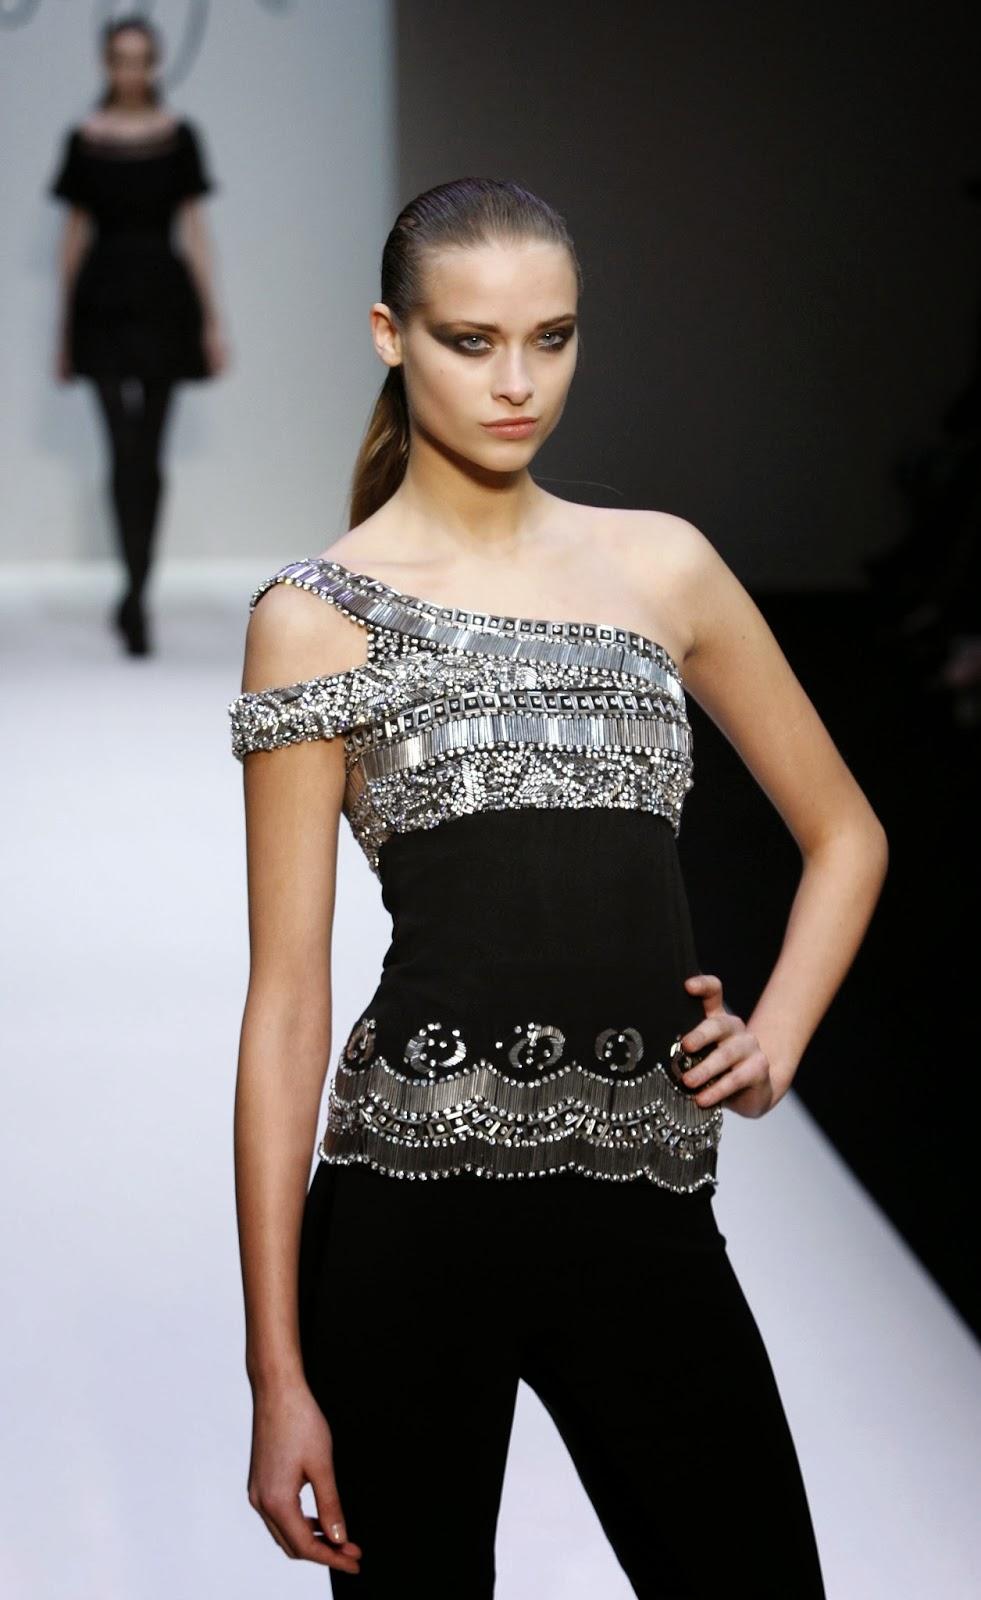 Clothing and Fashion Design: Women Fashion Clothing